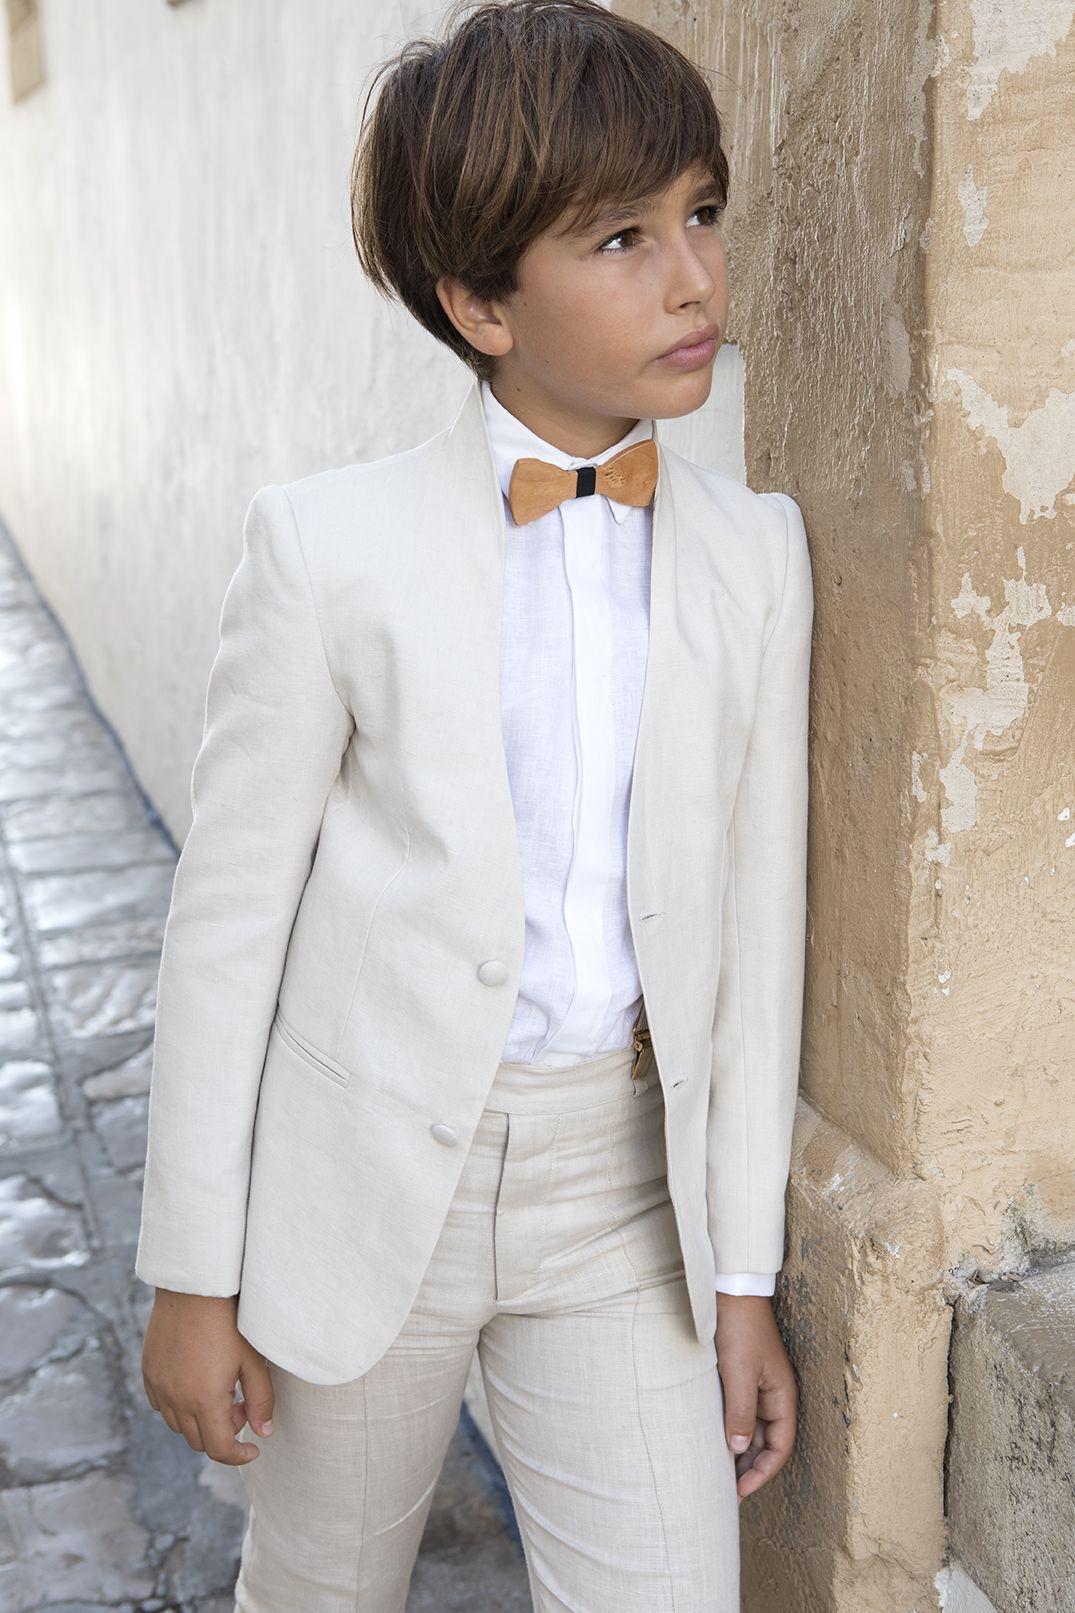 Ceremony Kids Collection Online - Manuel Pardo